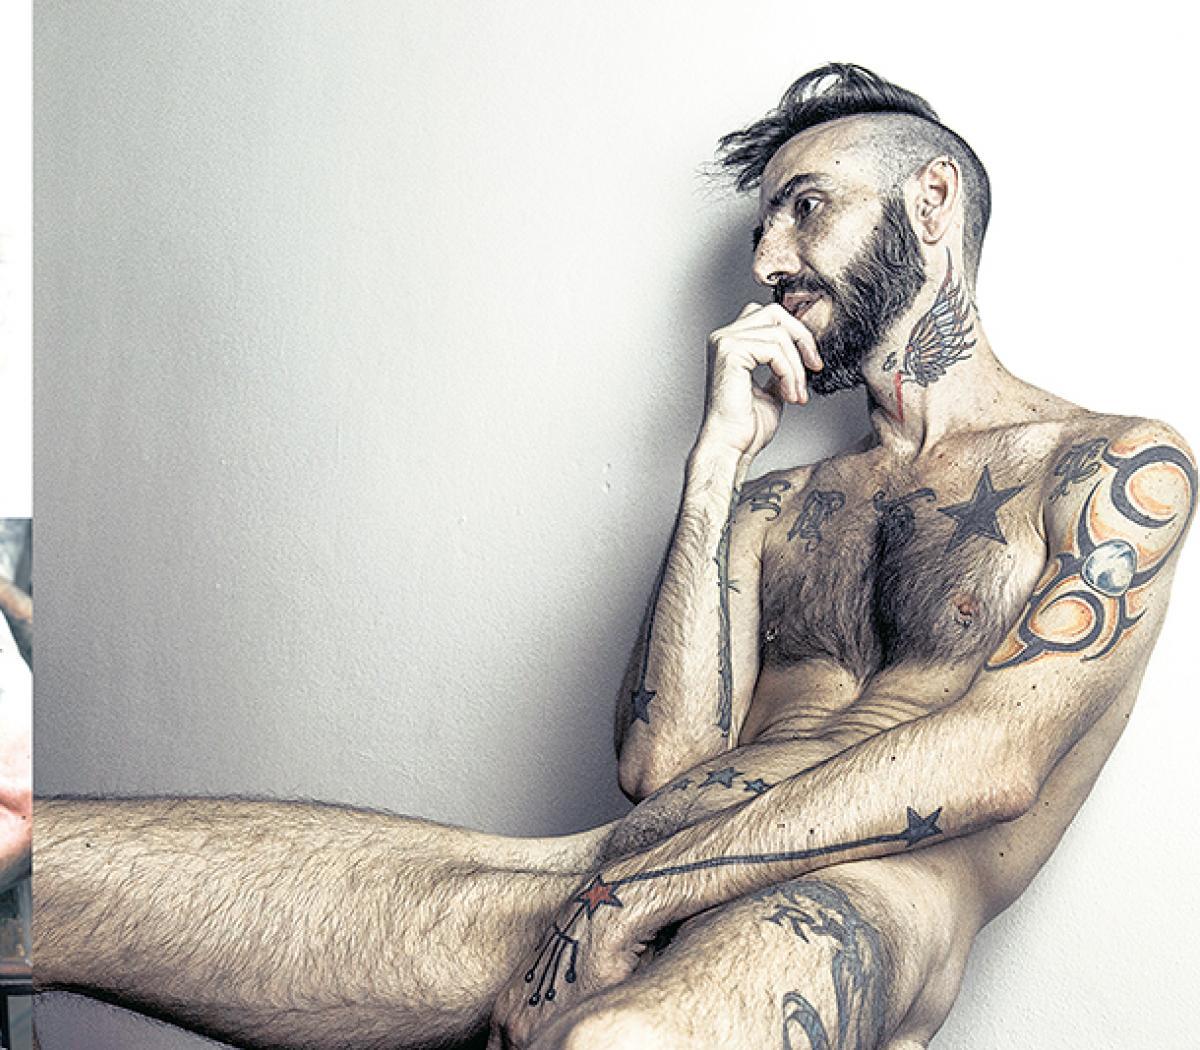 Actores Porno Gay Tatuajes gastonix j.s. romano | hablame de tu. de tu tatoo | página12